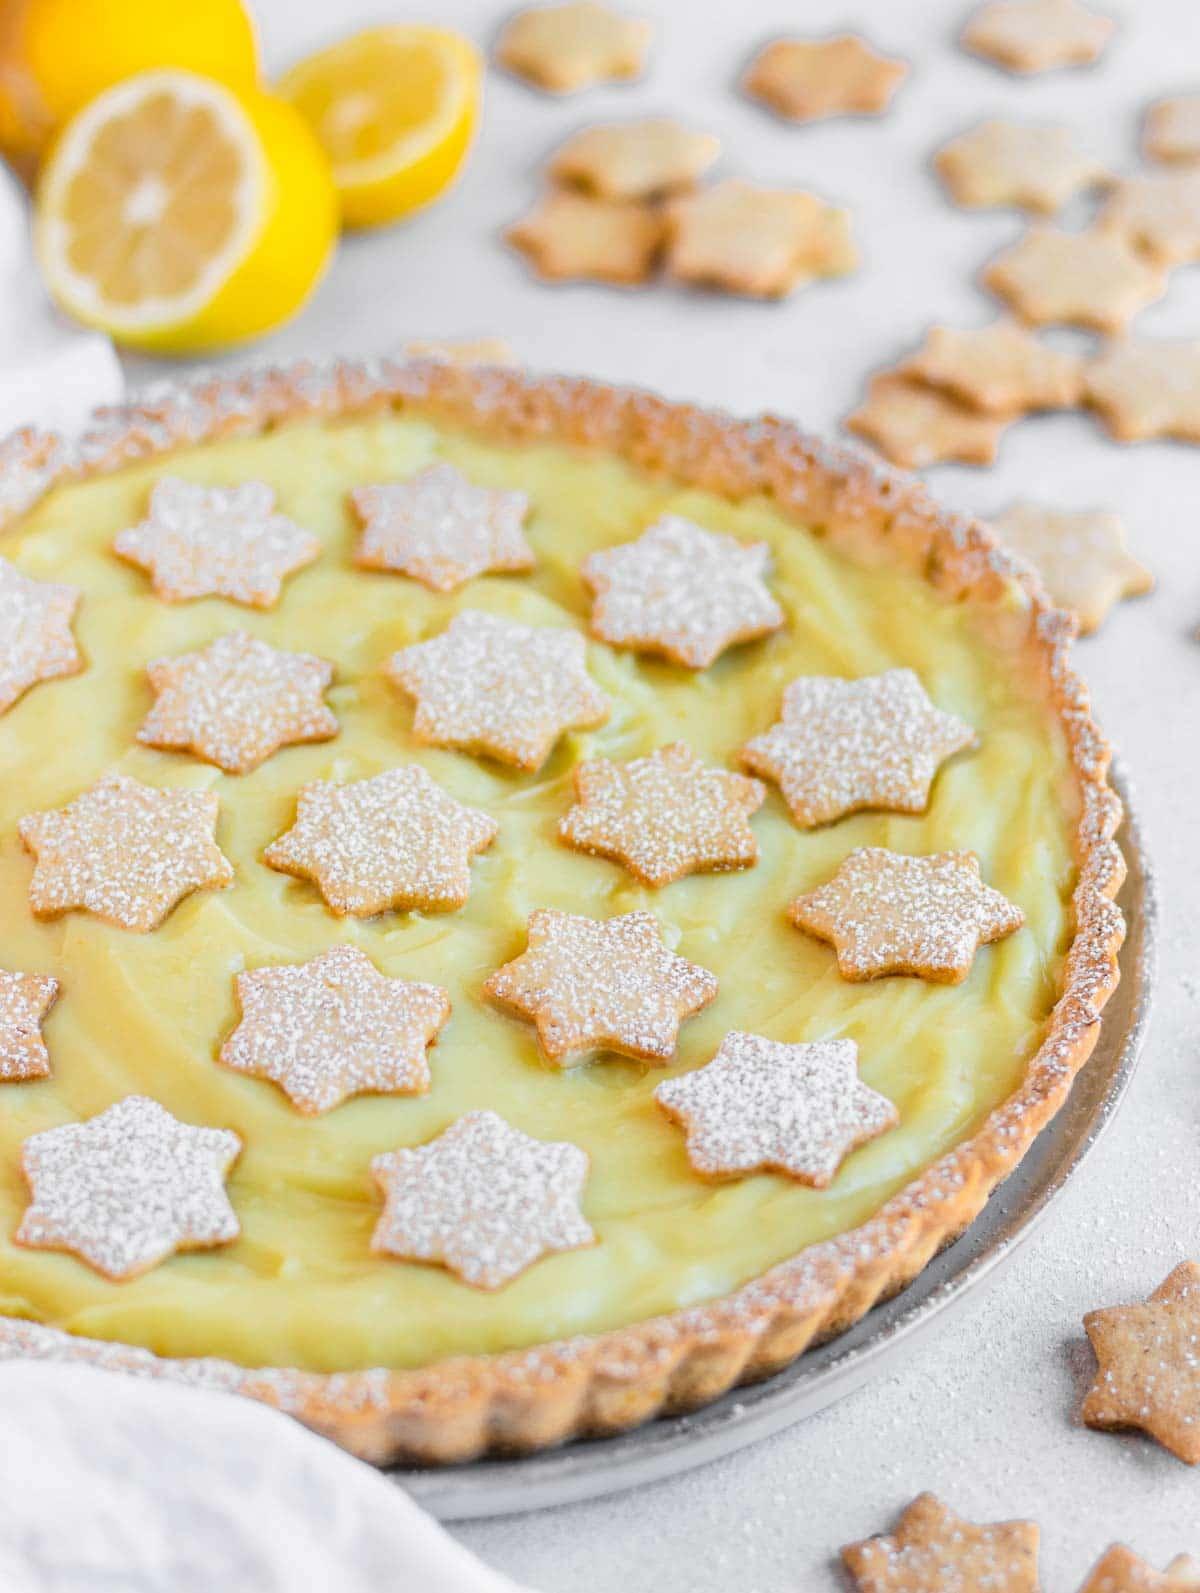 Vegan lemon tart with crunchy crust